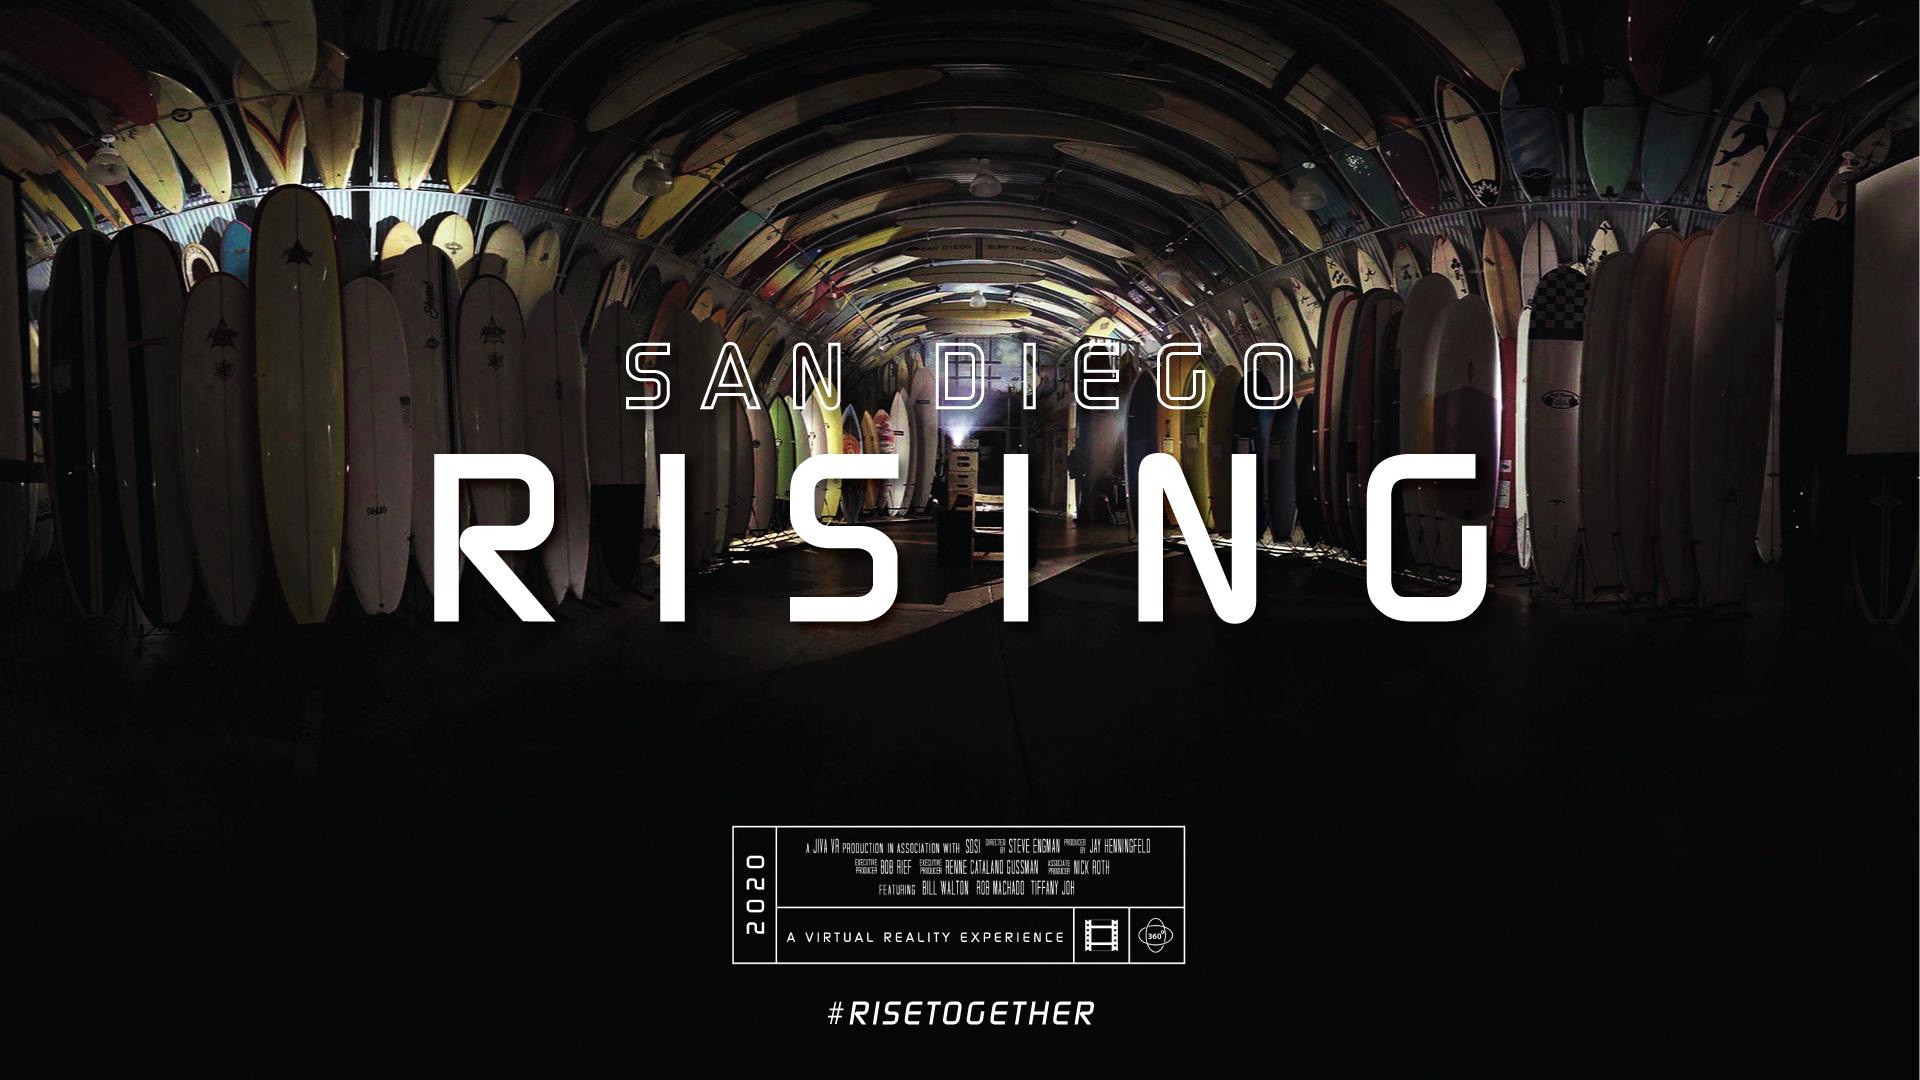 SD Rising